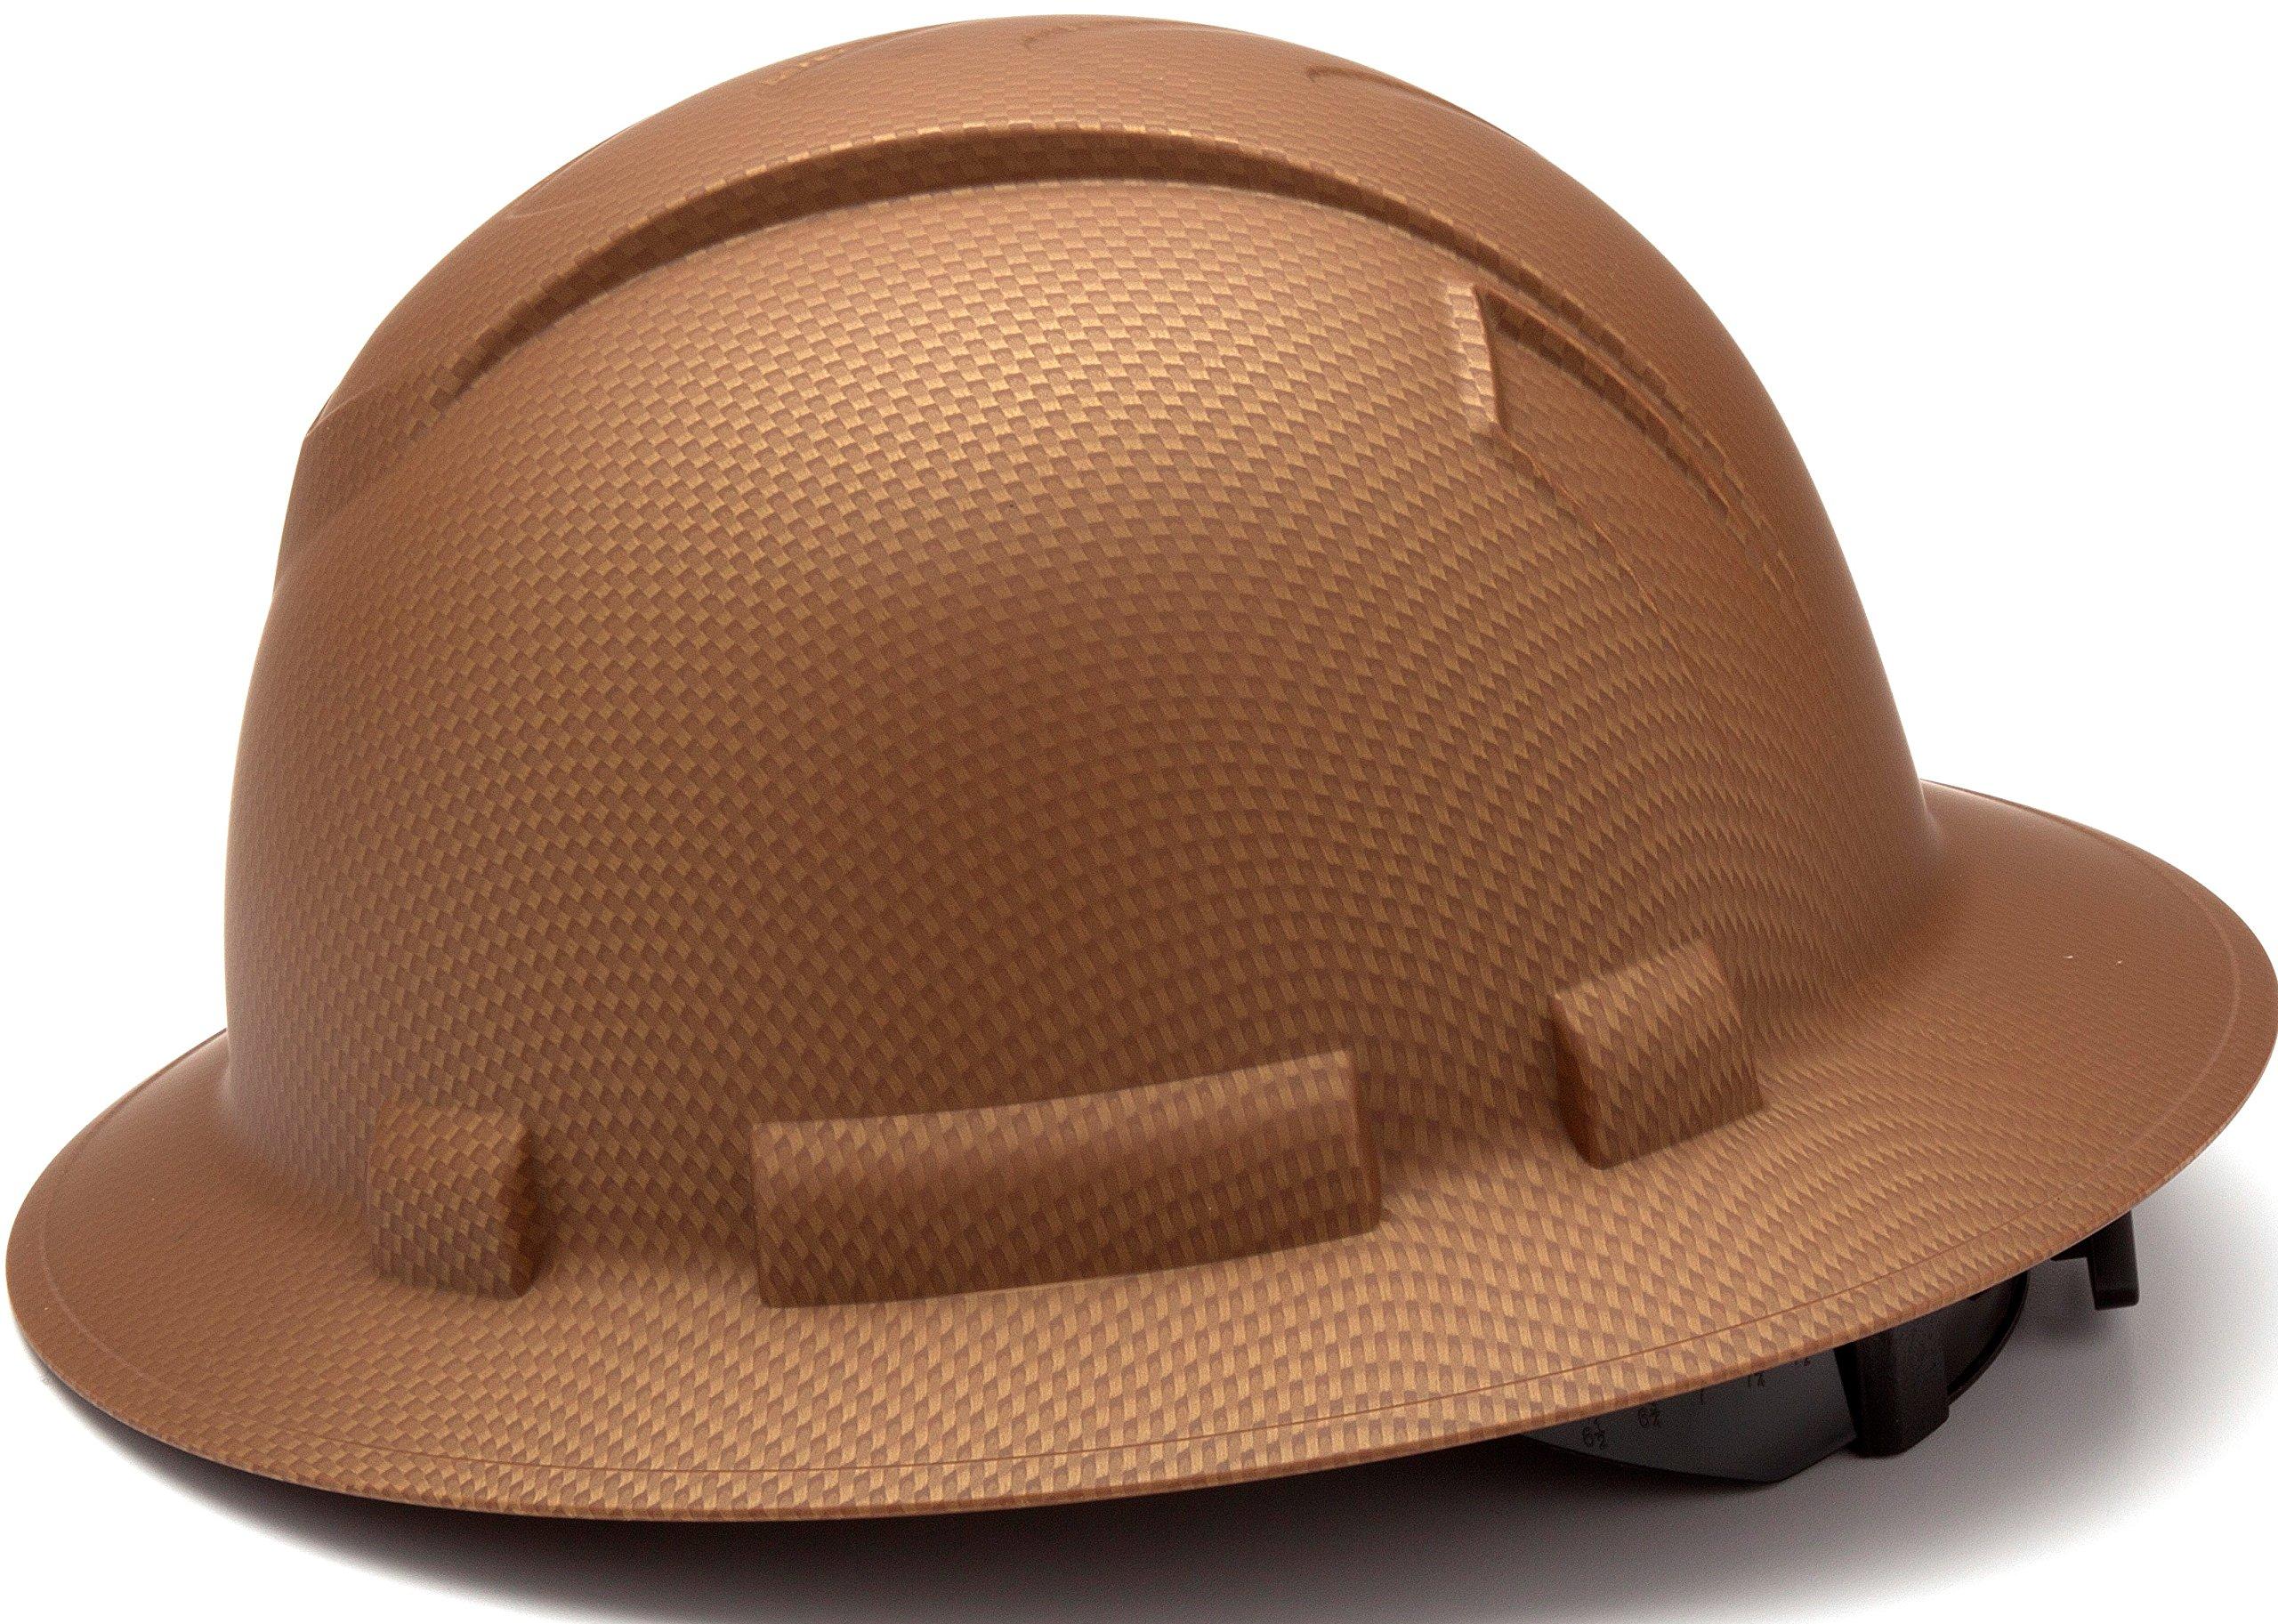 Pyramex Safety PYRAMEX - HP54118 - Copper - Full Brim Ridgeline Full Brim Graphite Pattern Hard Hat, Copper Graphite Pattern by Pyramex Safety (Image #3)